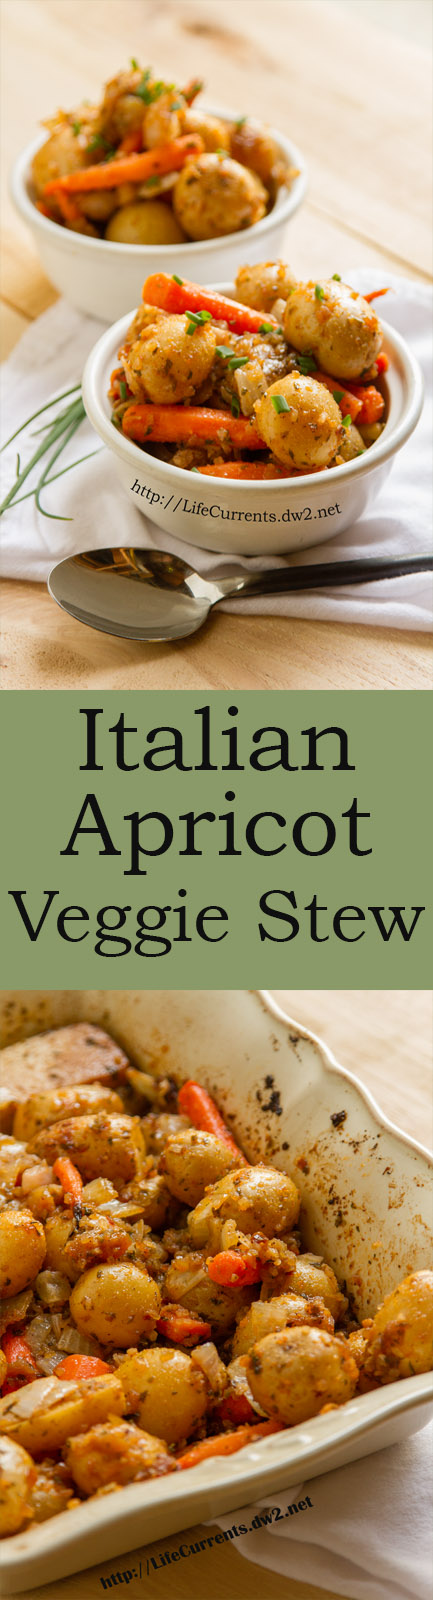 Vegetarian Italian Apricot Stew Recipe